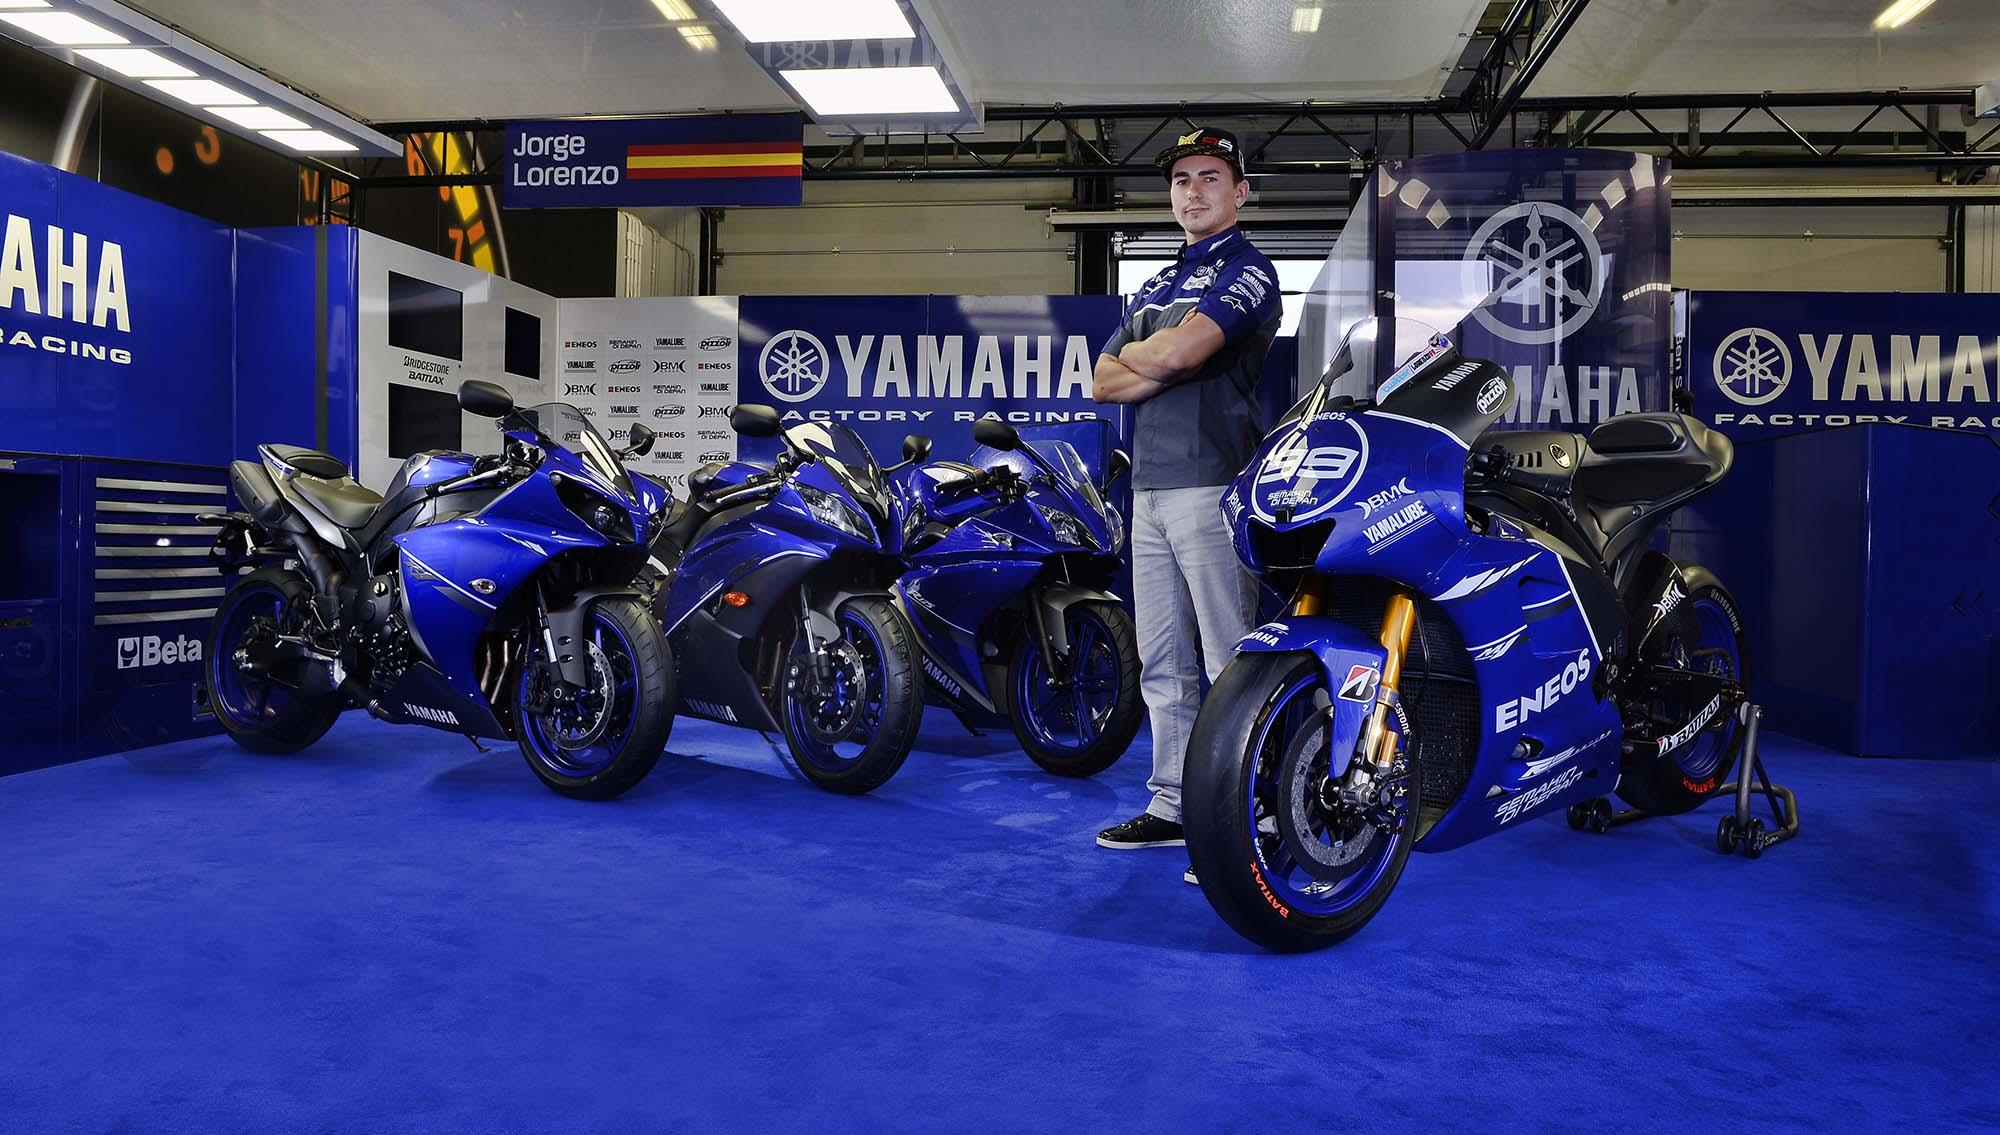 MotoGP: Yamaha Racing Goes Blu for Misano & Aragon - Asphalt & Rubber